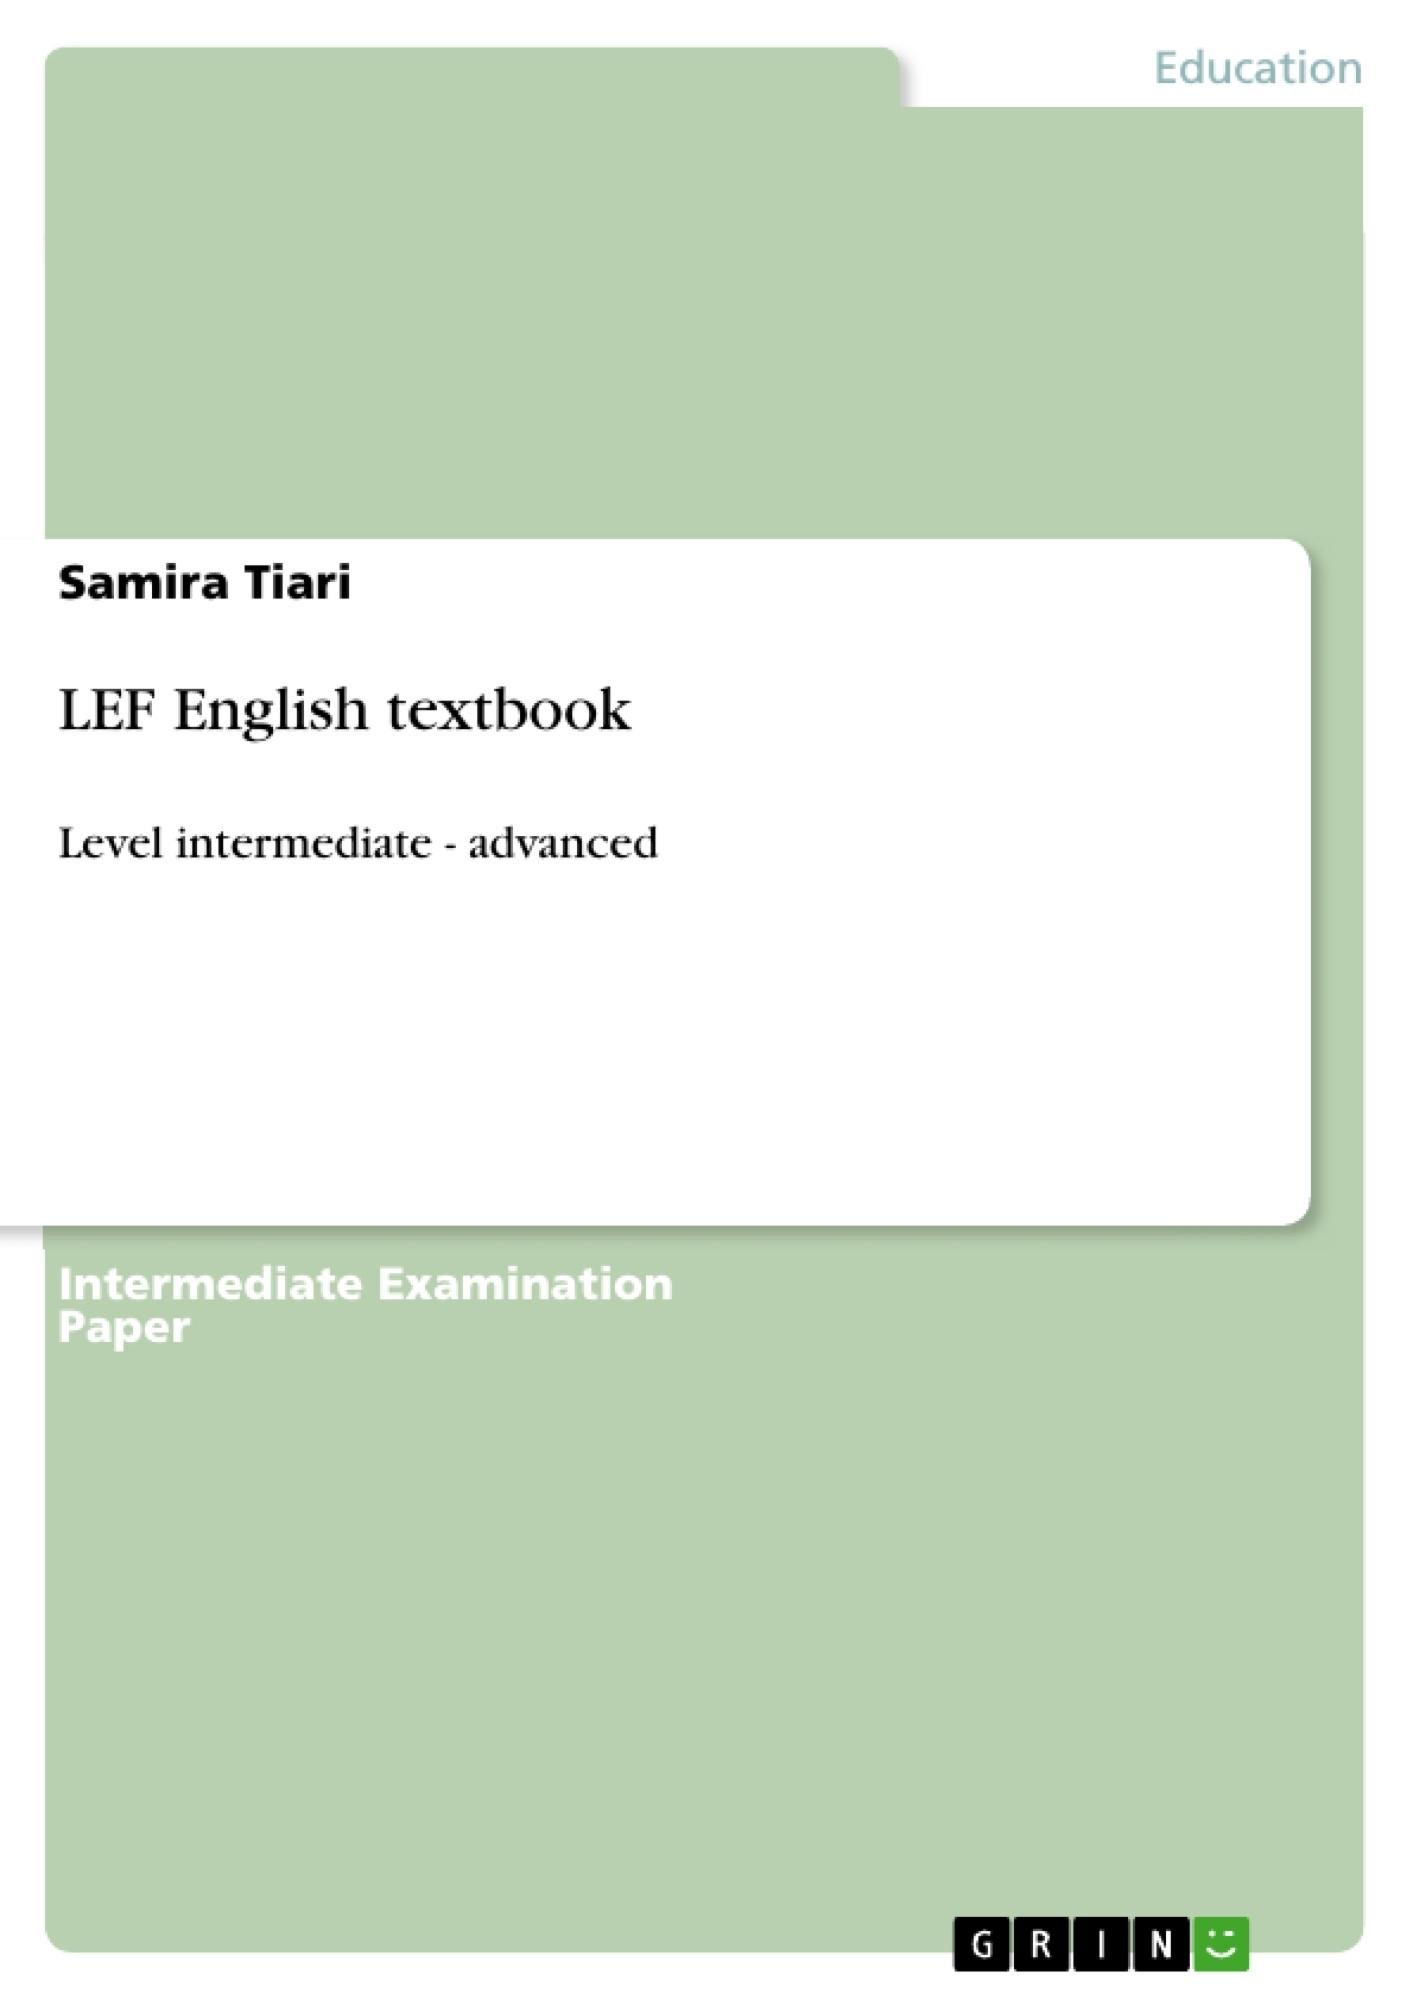 Title: LEF English textbook